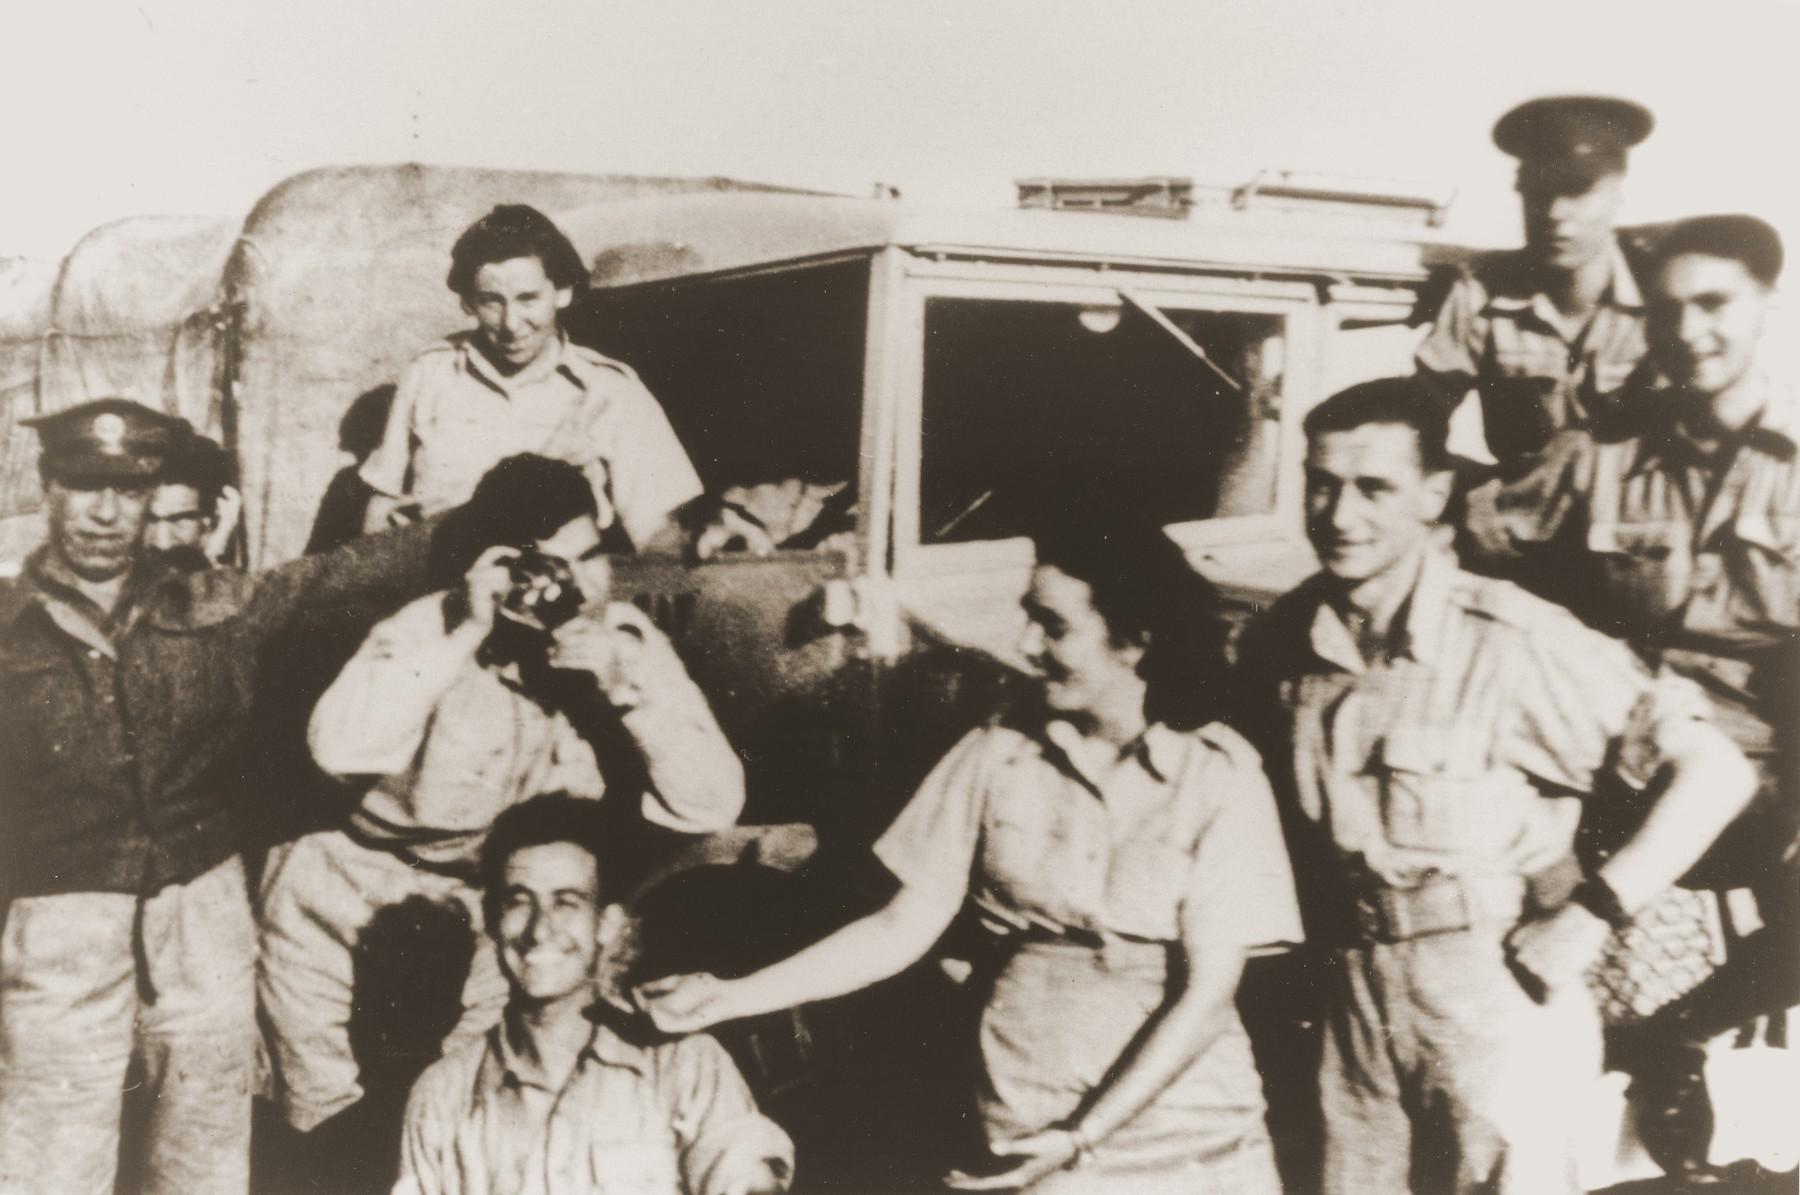 Palestinian Jewish parachutists Haviva Reik, Baruch Kamin, Uriel Kanner, Dov Berger (Harari), Tsadok Doron and Sara Braverman go sightseeing while in Egypt for their training.